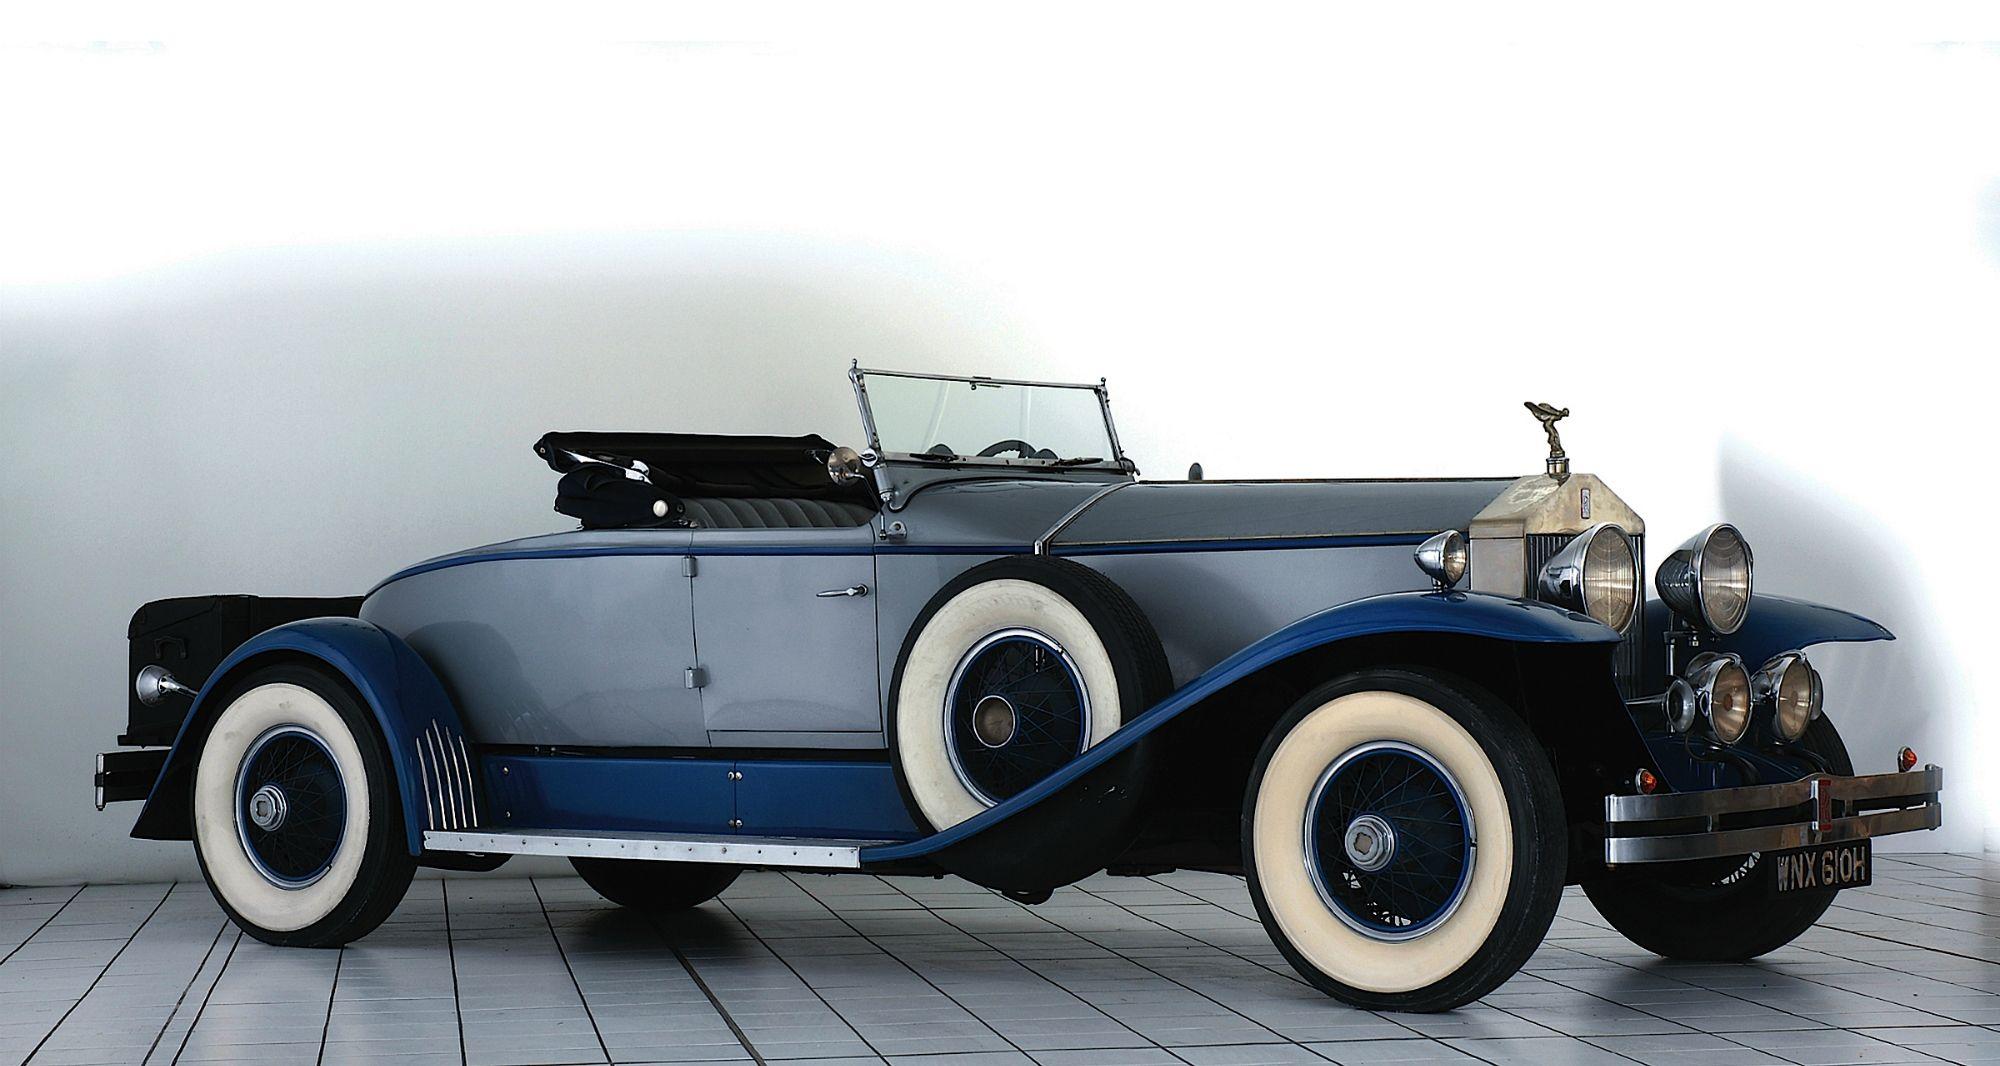 1926 rolls royce springfield silver ghost picadilly roadster rolls royce classic cars trucks classic rolls royce pinterest